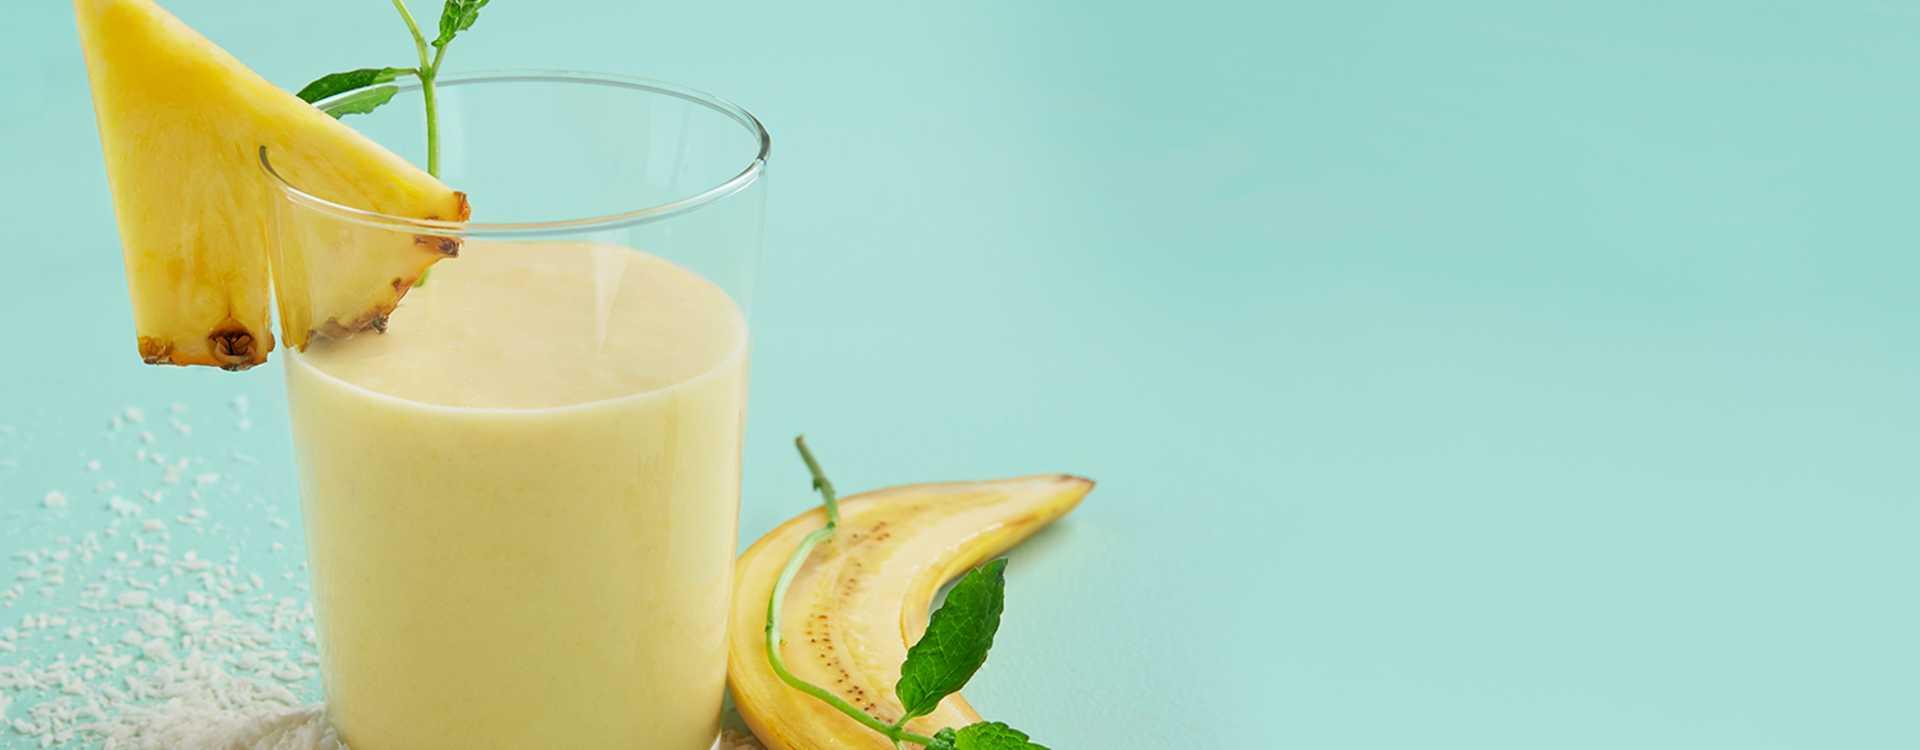 Smoothie med banan, kokosmelk og ananas